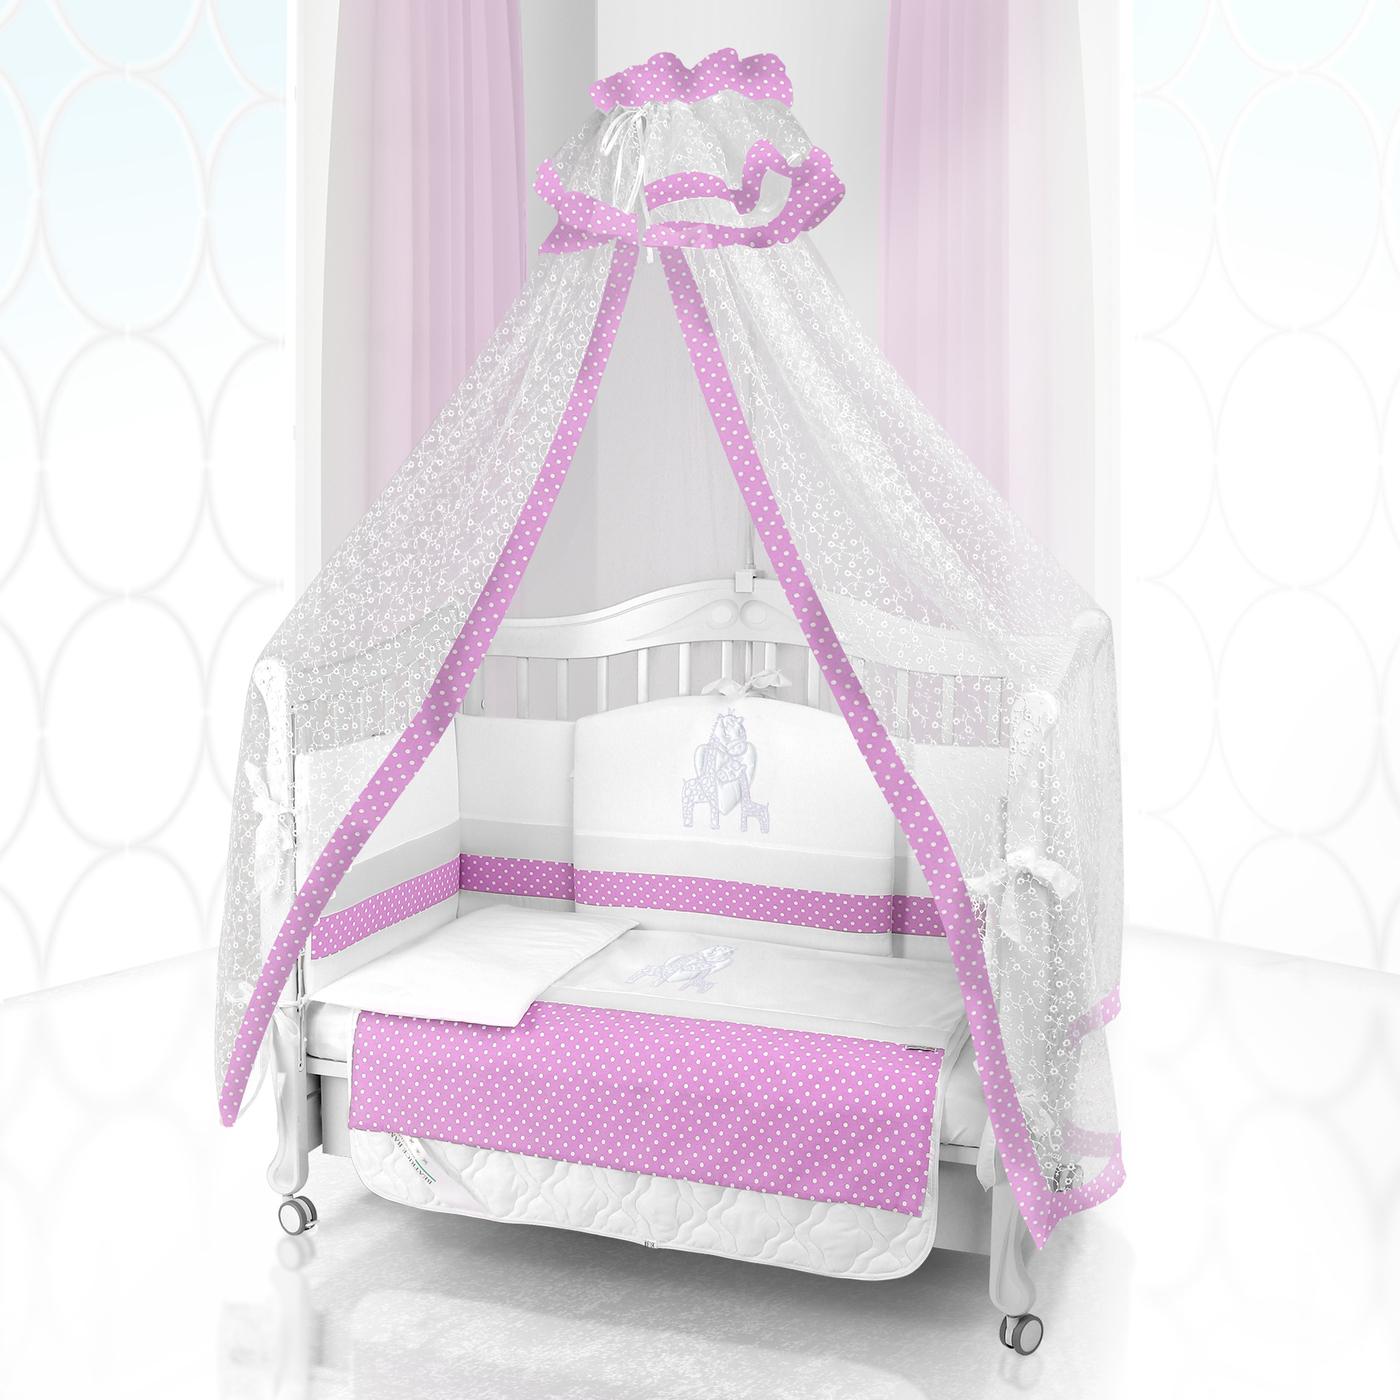 Комплект постельного белья Beatrice Bambini Unico Punto Di Giraffa (125х65) - bianco& rosa